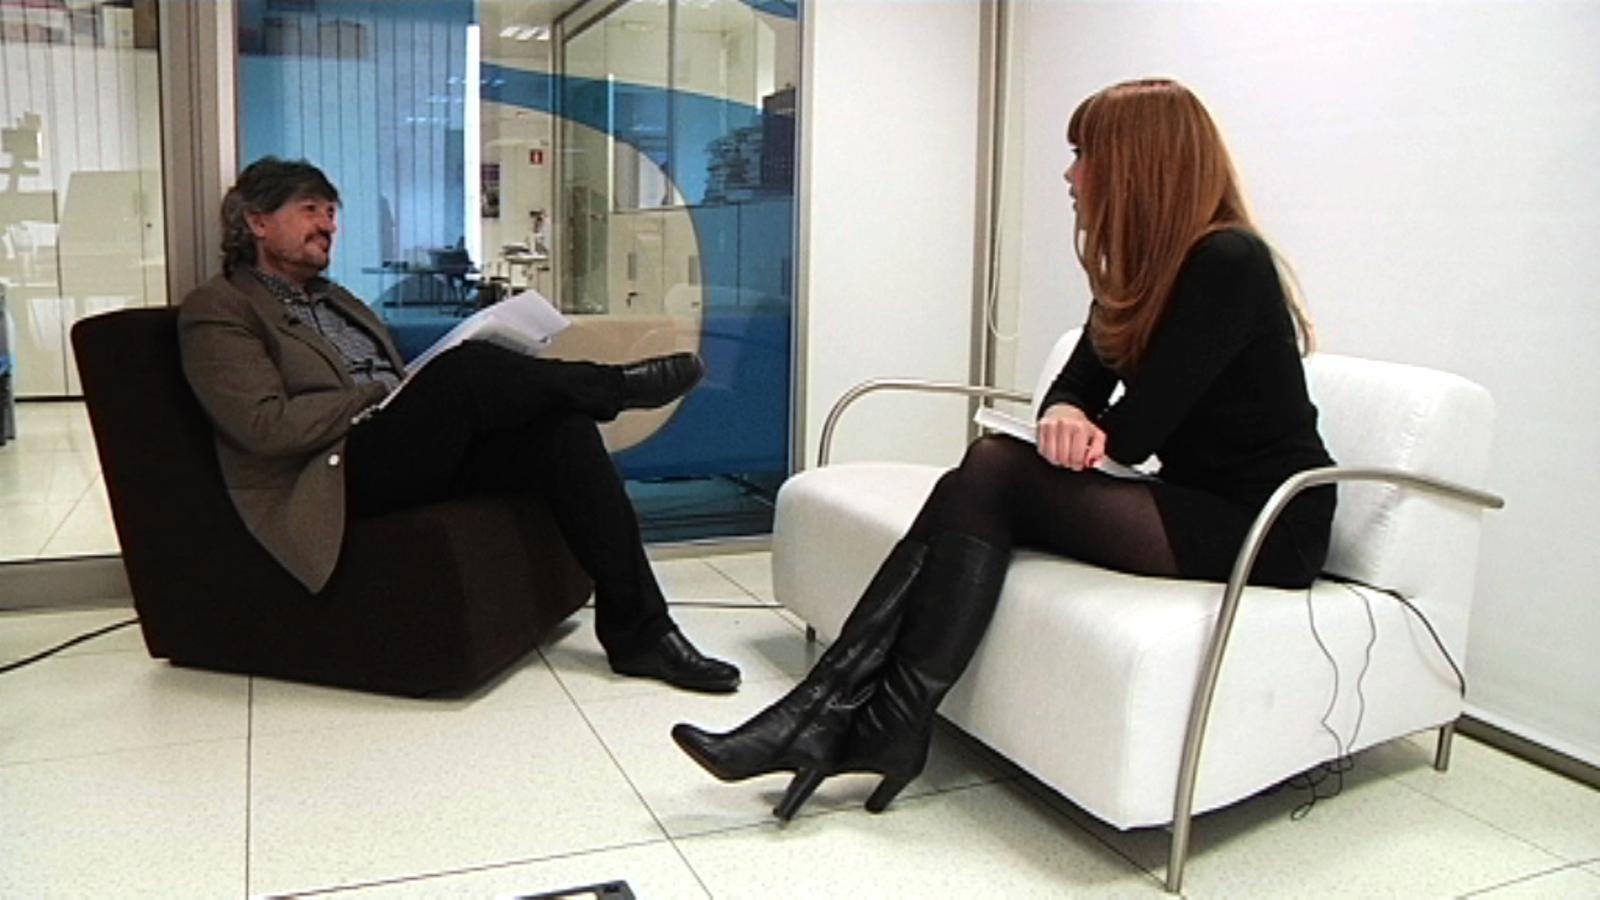 Entrevista de Carles Capdevila a Paula Bonet